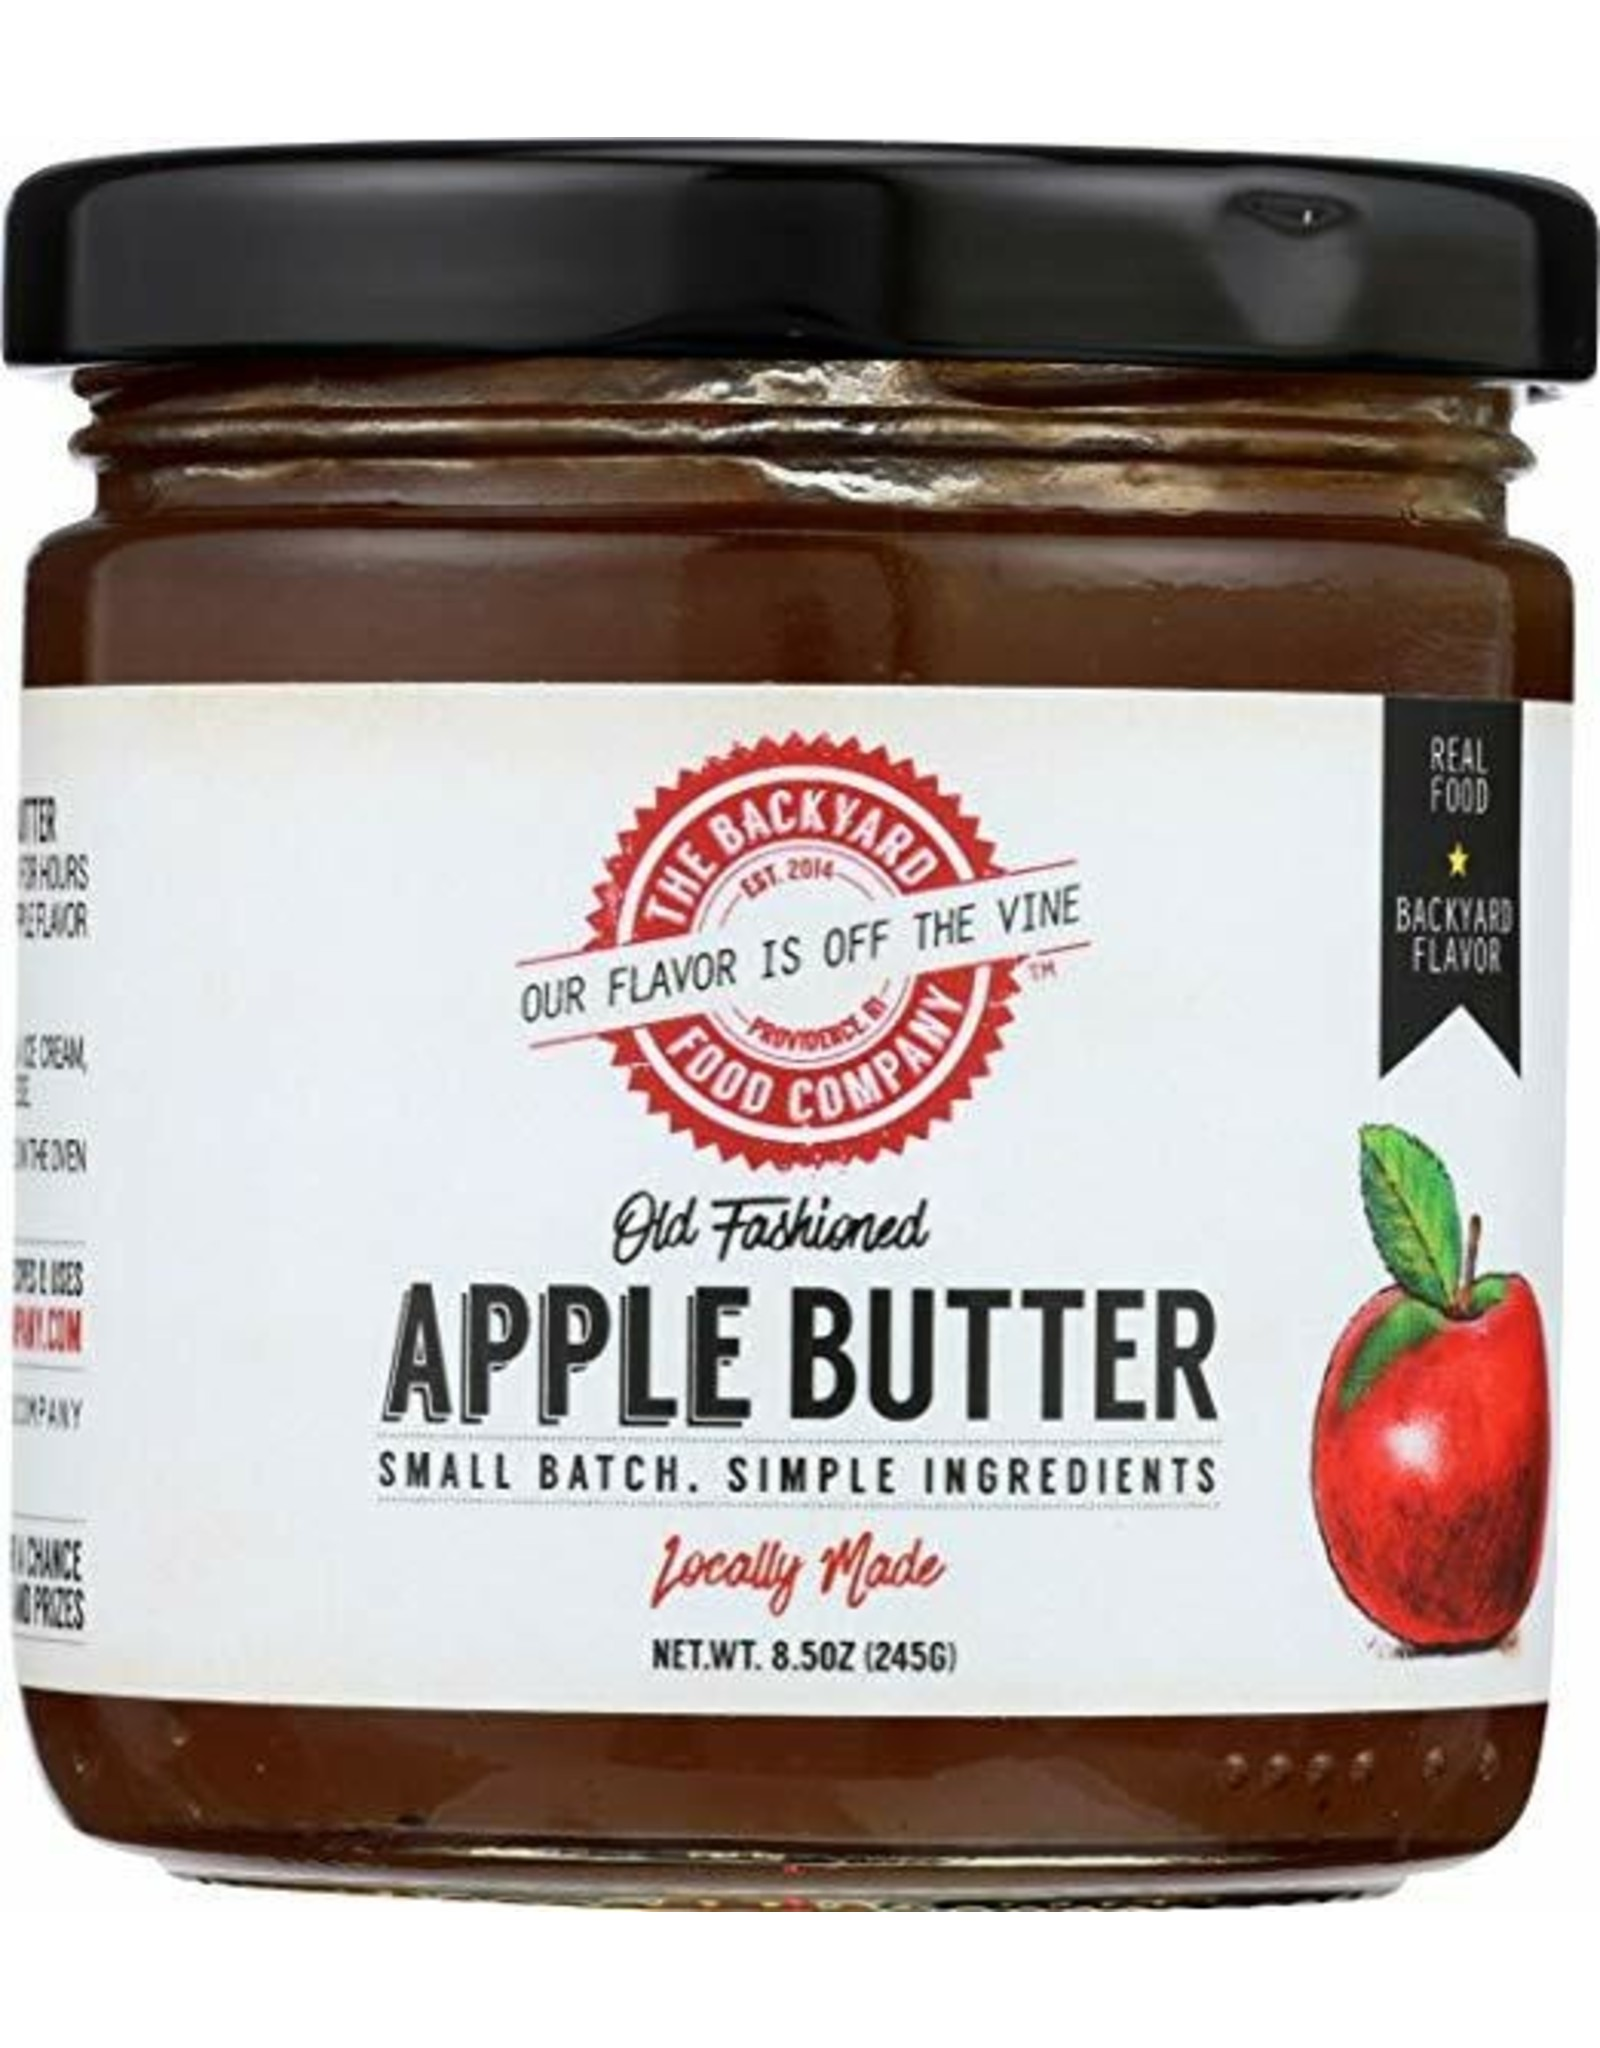 The Backyard Food Company RI Backyard Food Co. Apple Butter